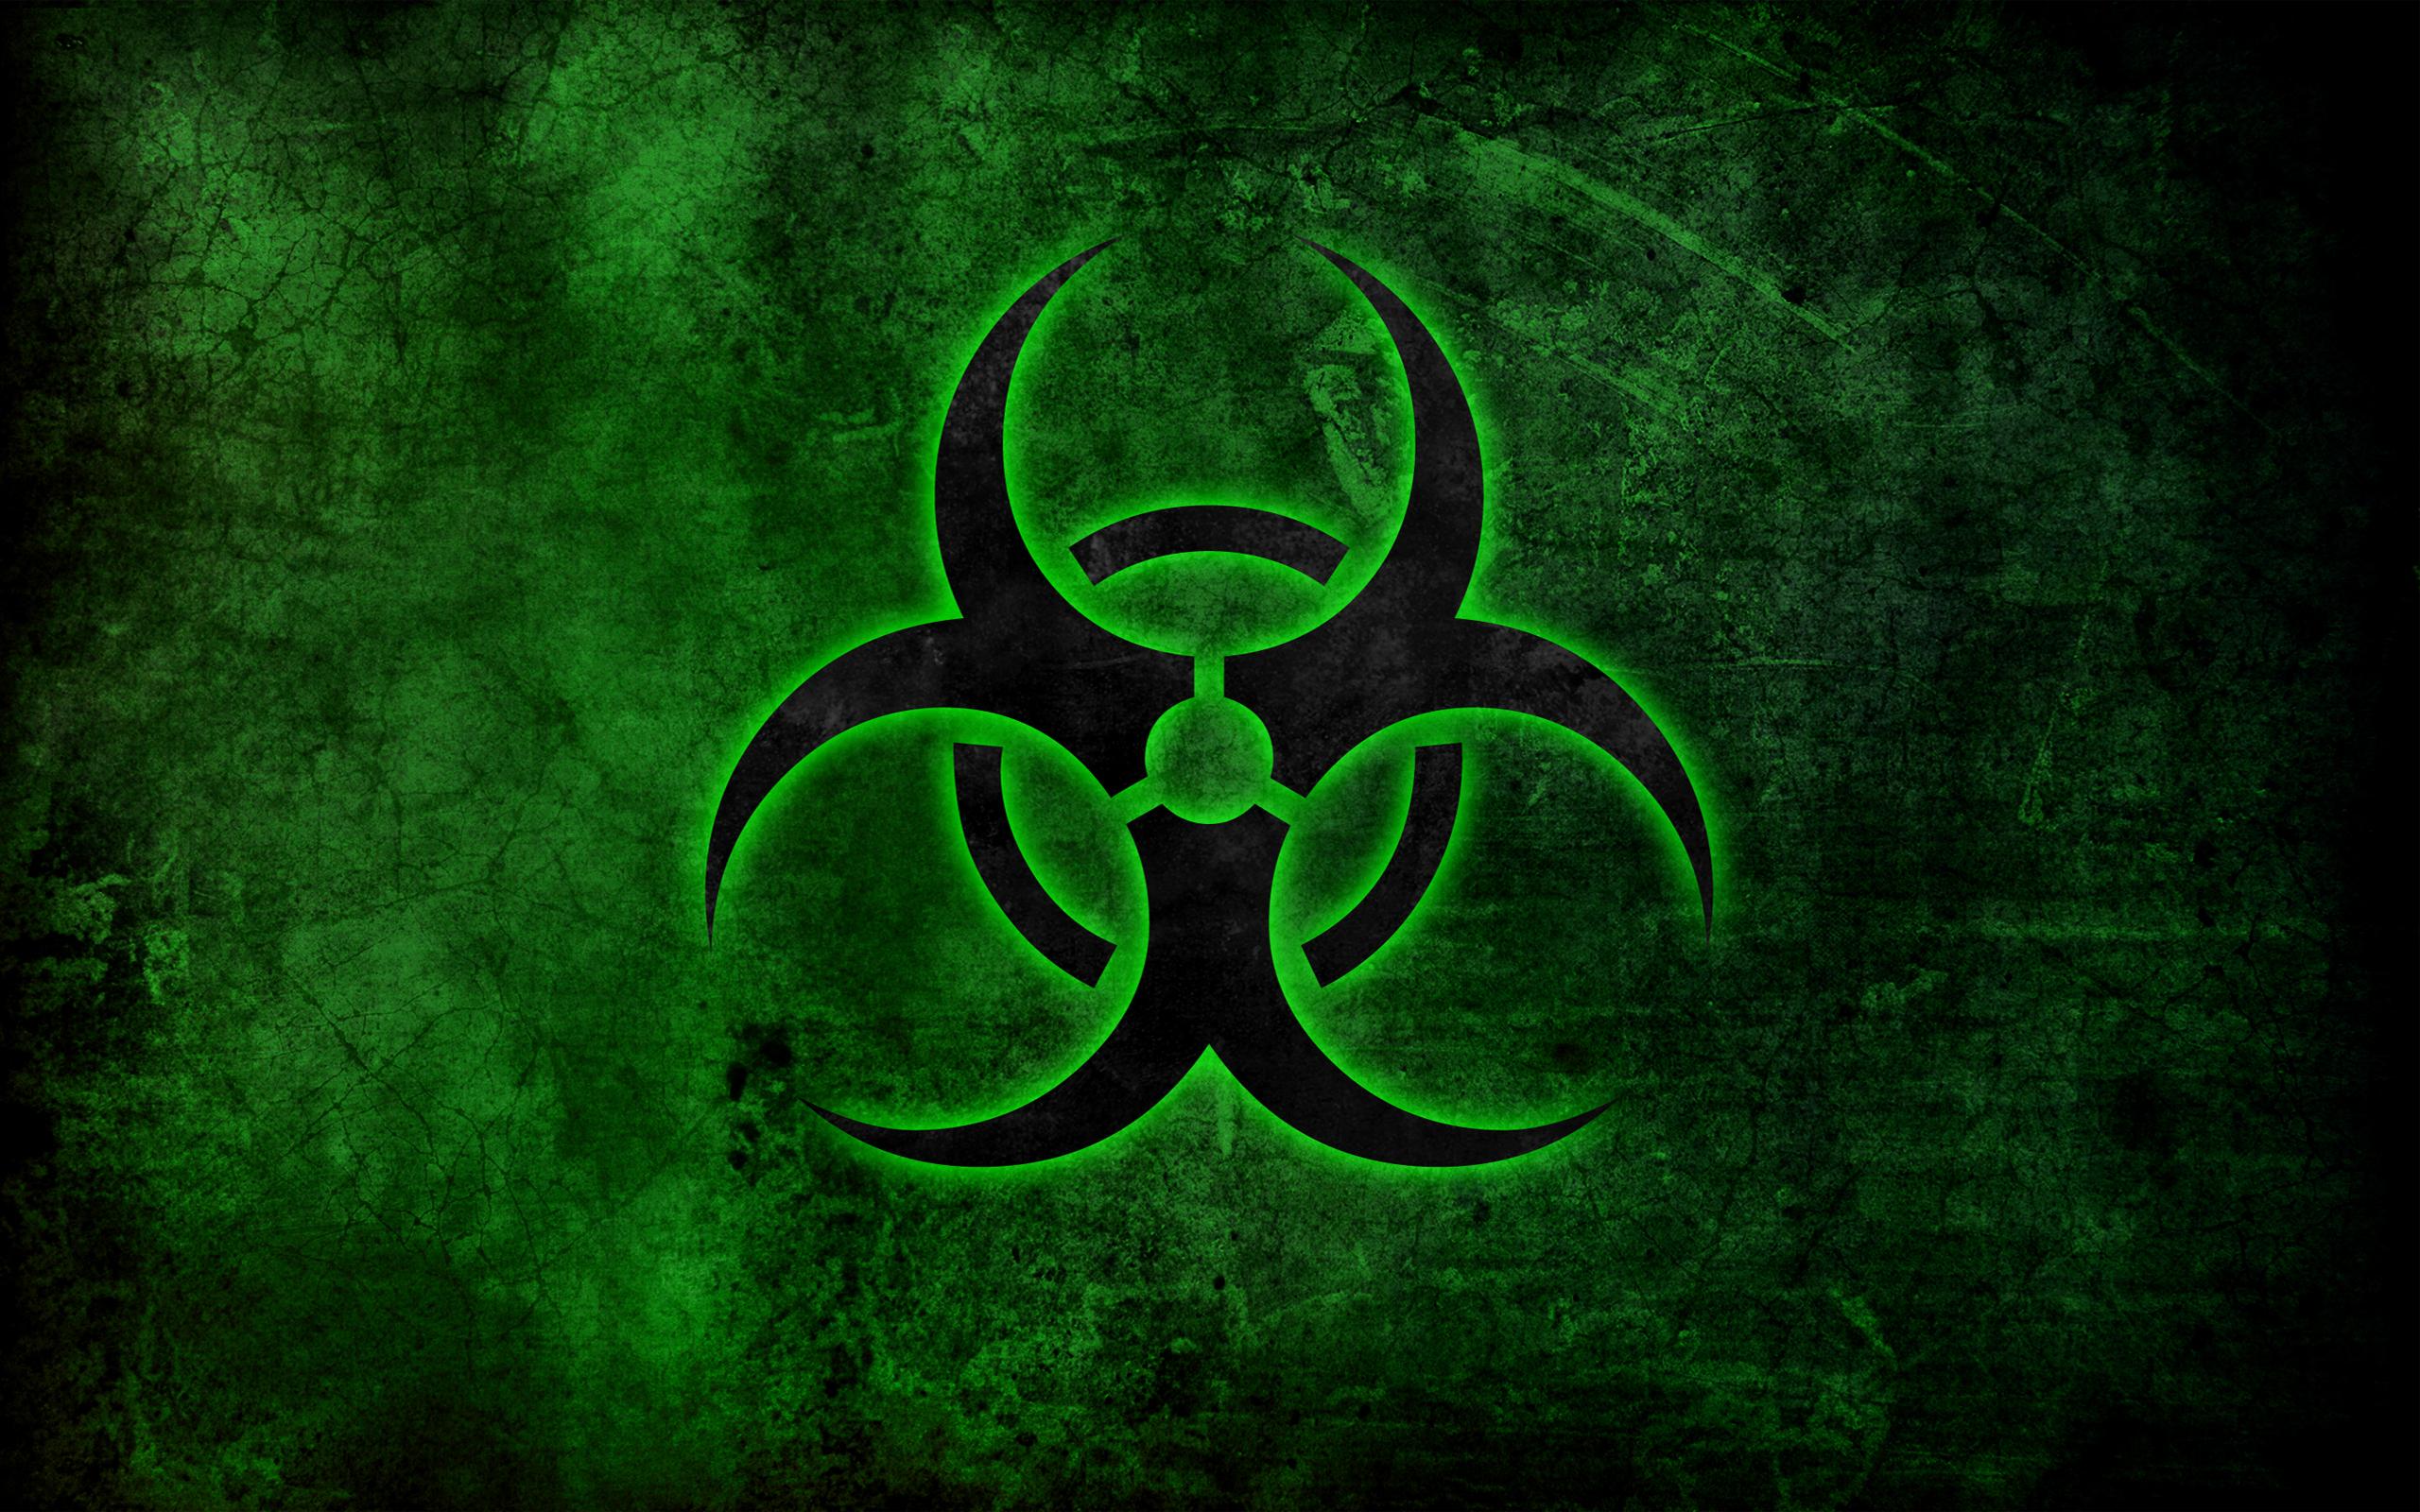 High Resolution Wallpaper   Biohazard 2560x1600 px